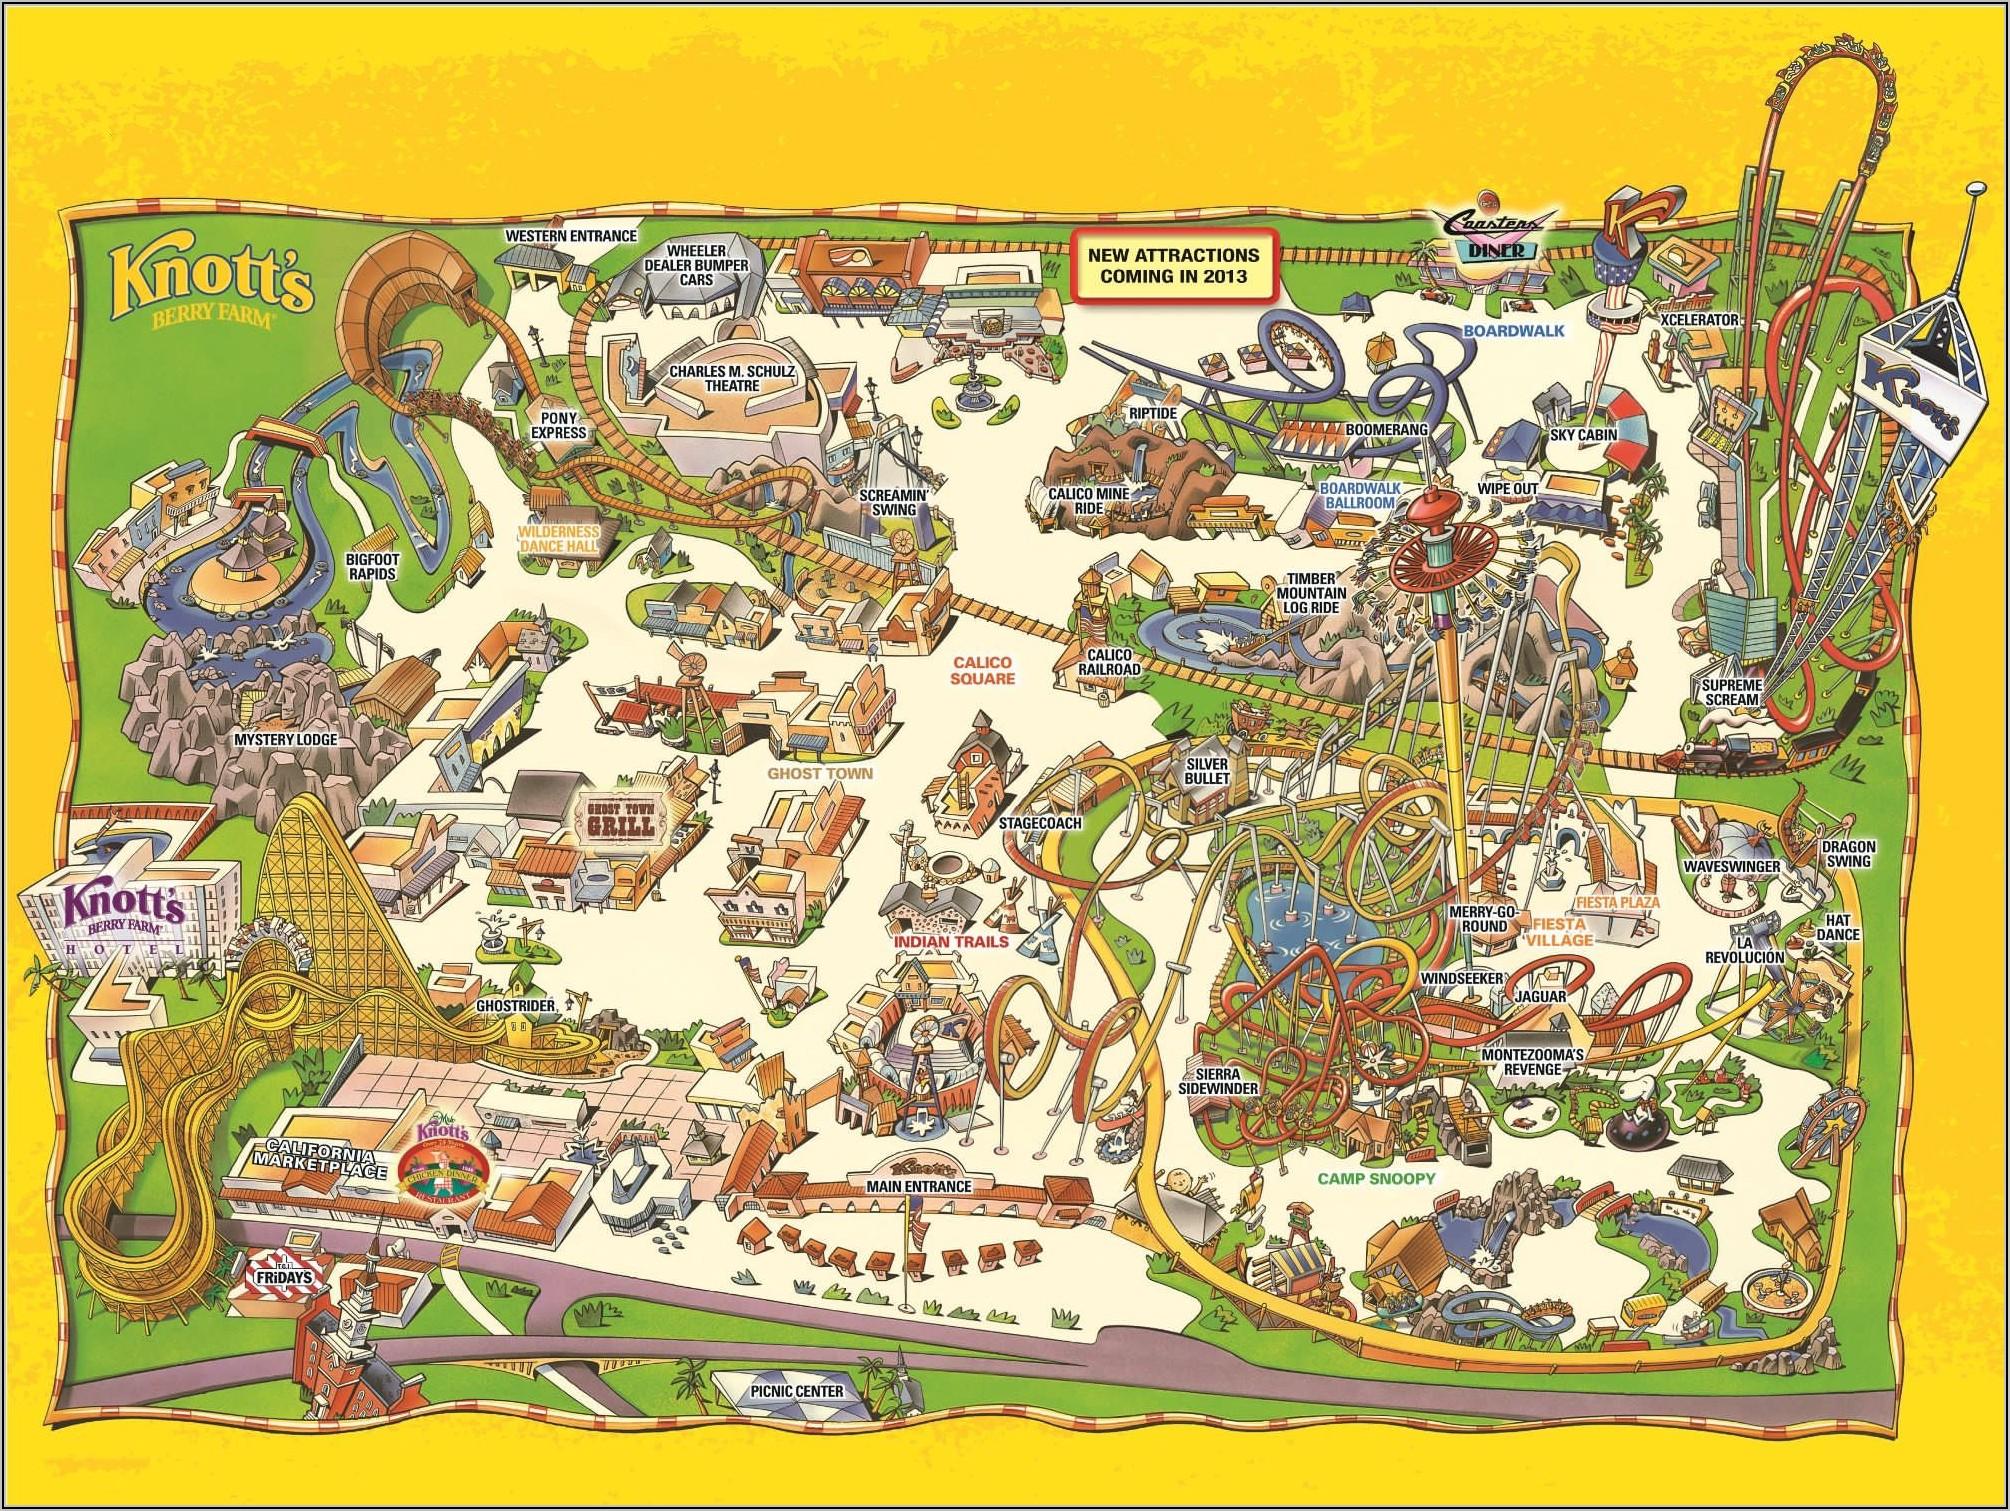 Map Of Knott's Berry Farm Buena Park